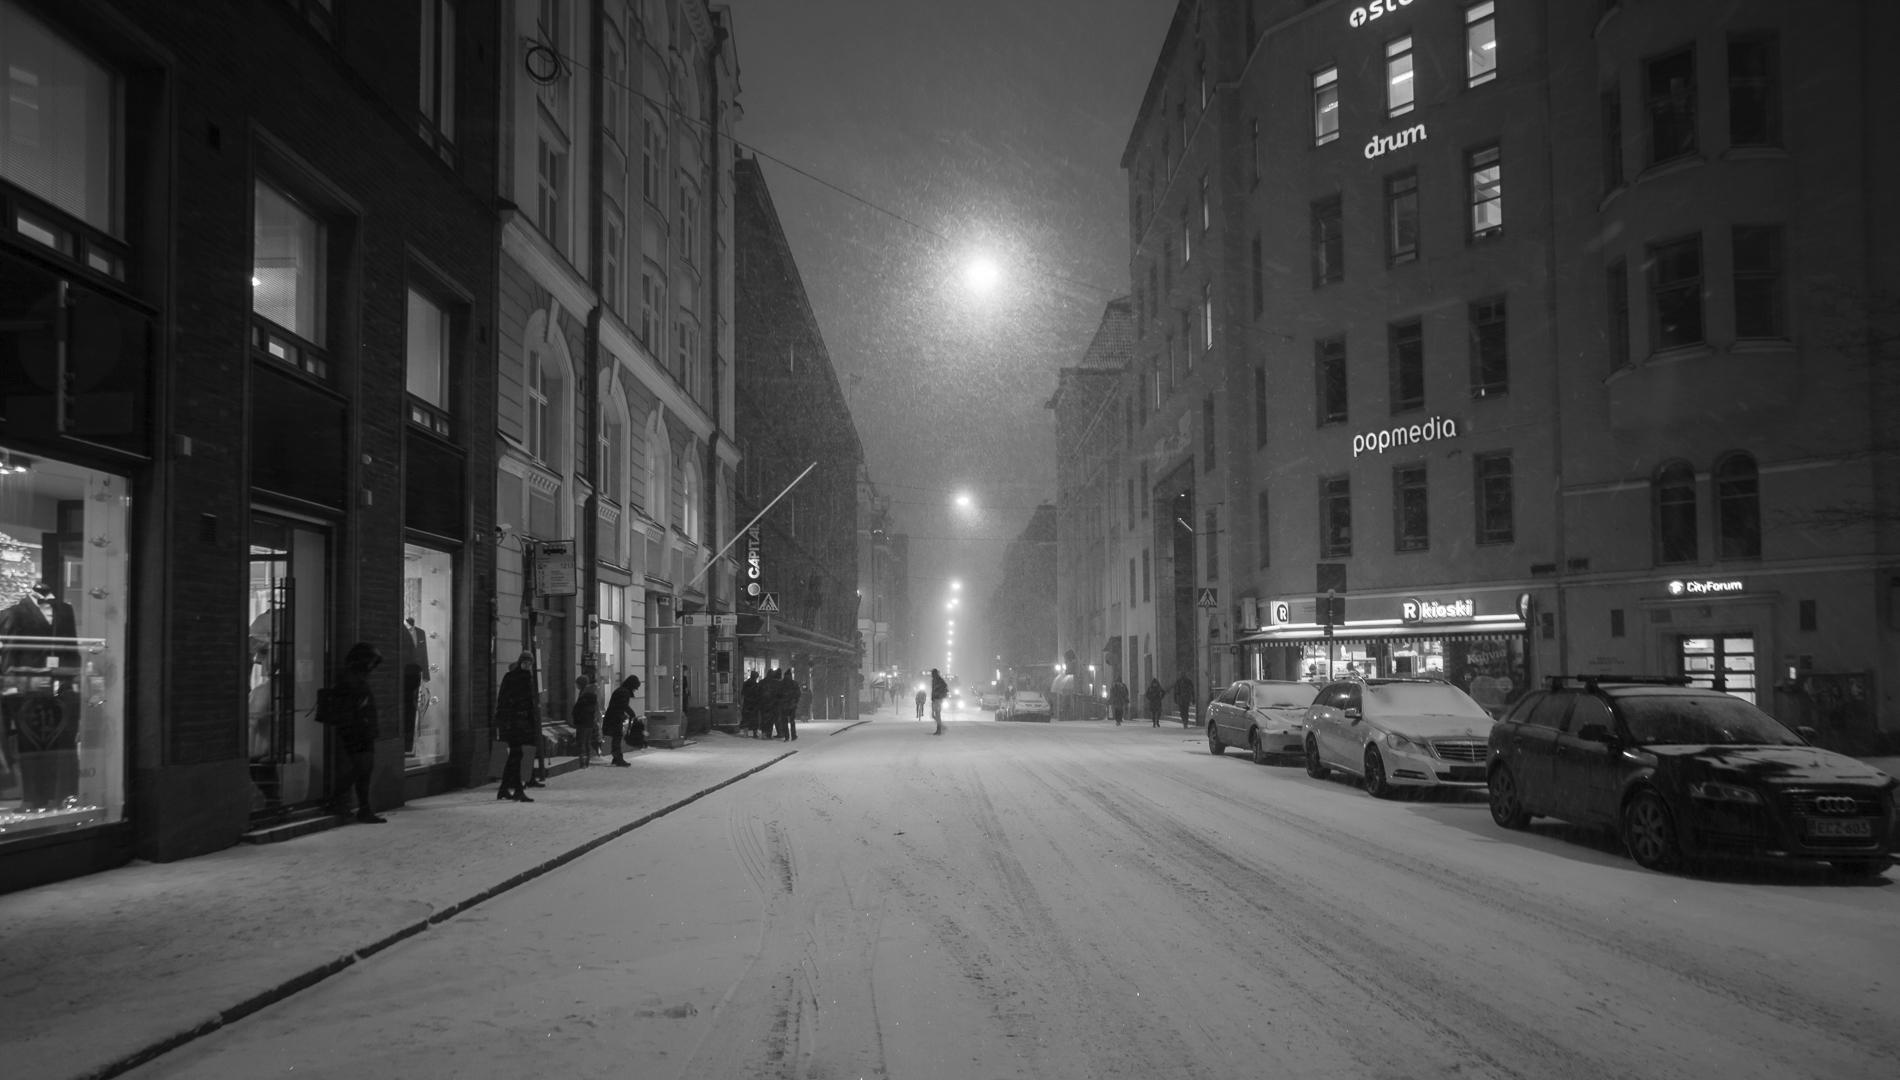 Winter game city - photography, cityscape - anttitassberg | ello